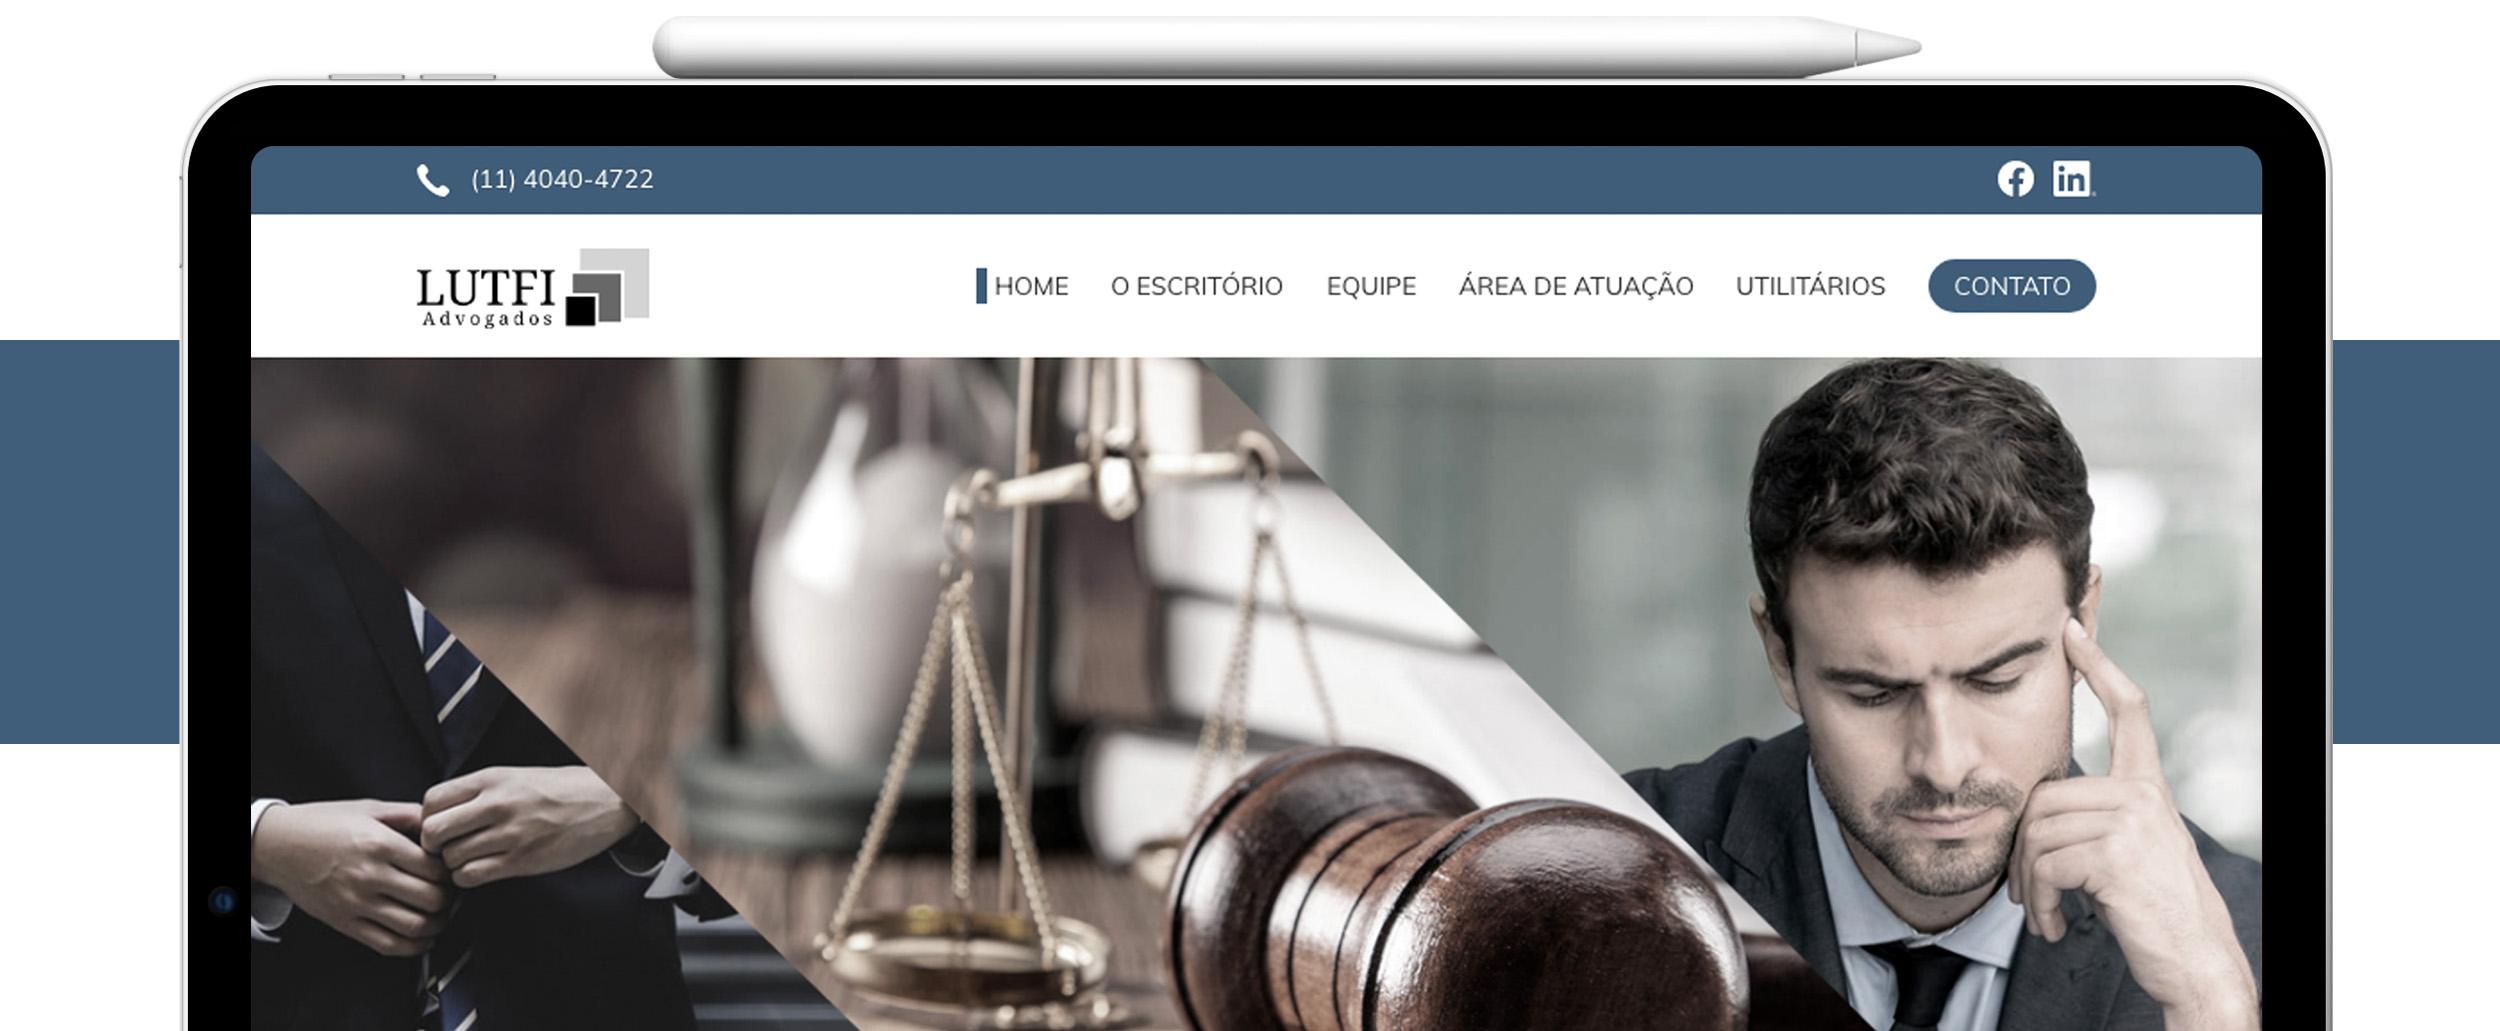 <p><span>Lutfi</span></p> Advogados